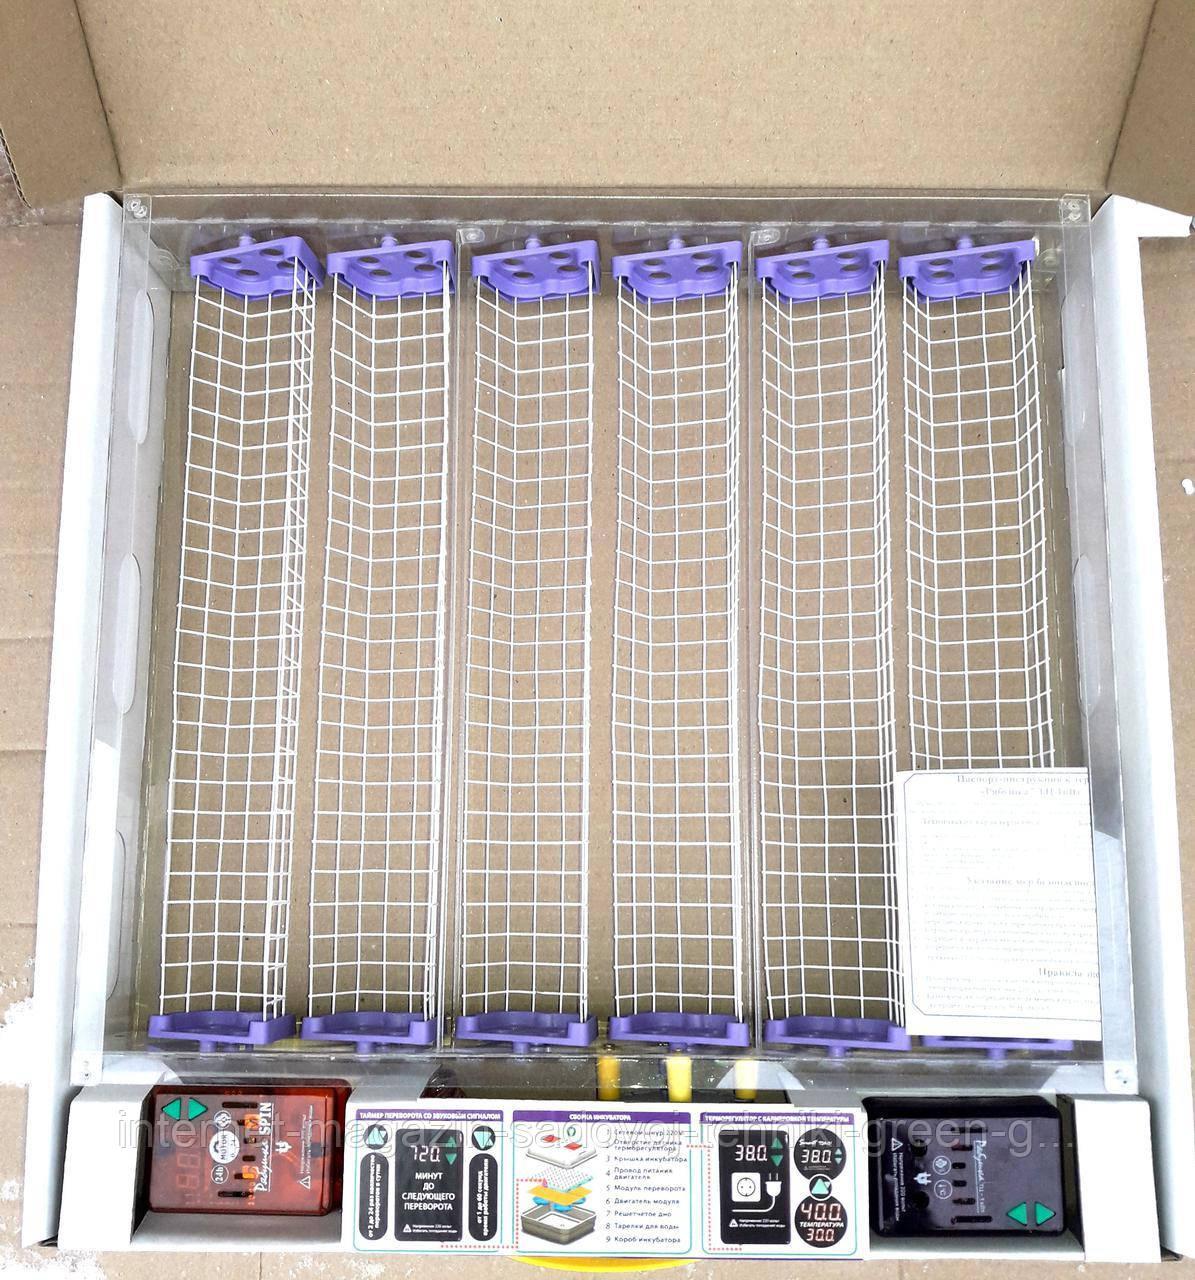 Модуль для автоматического переворота яиц Рябушка 120 с таймером и цифровым терморегулятором